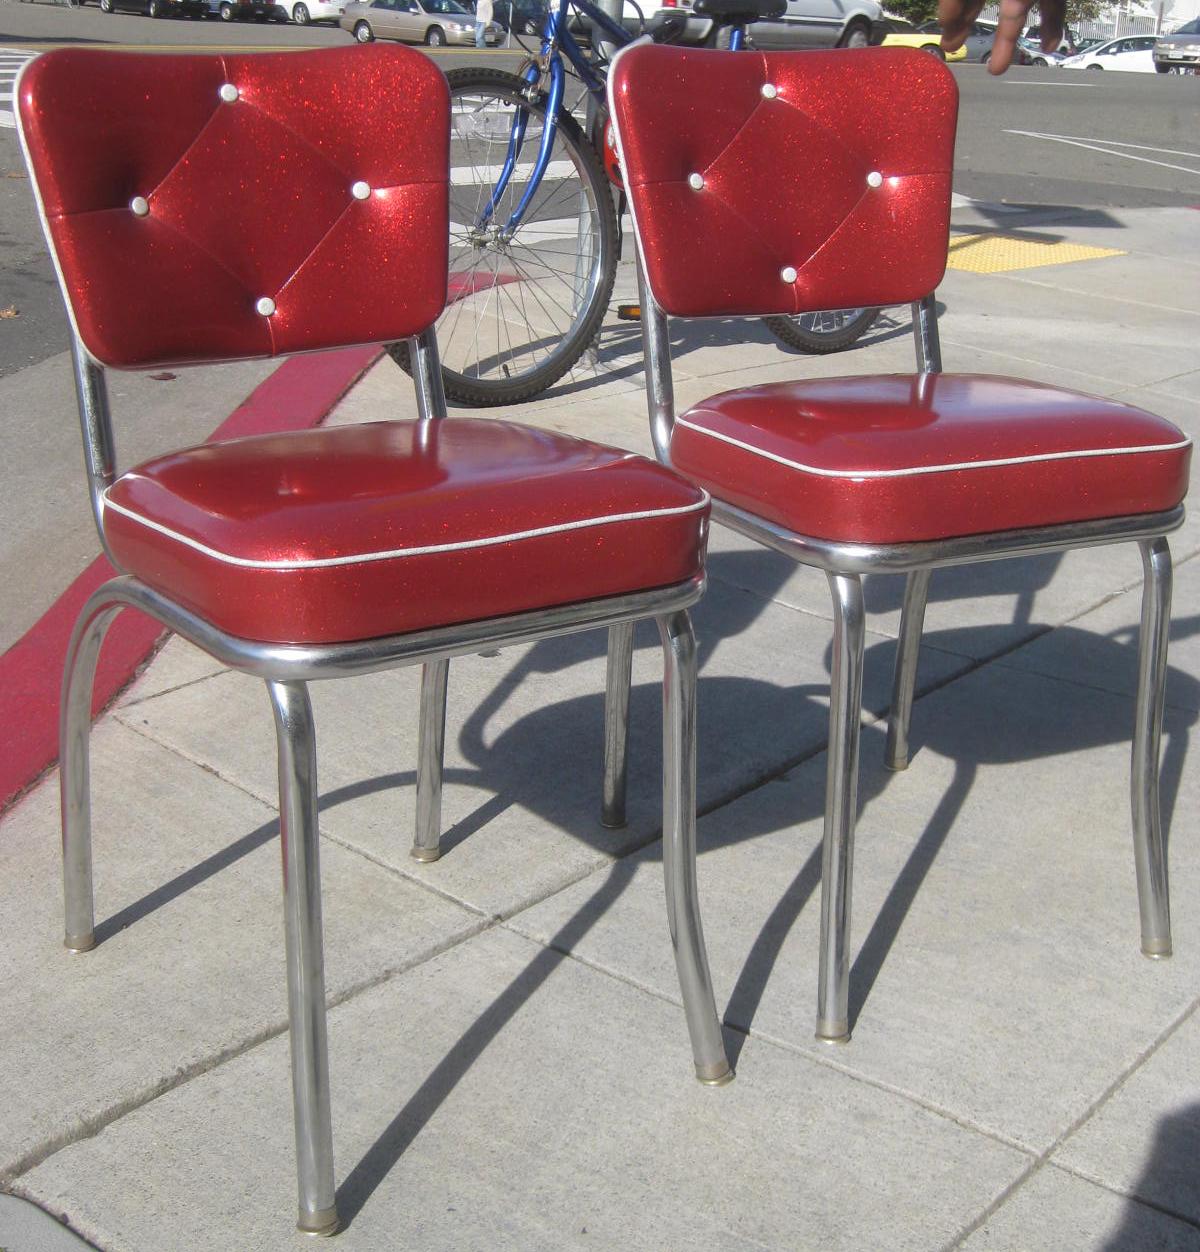 retro kitchen chairs photo - 3